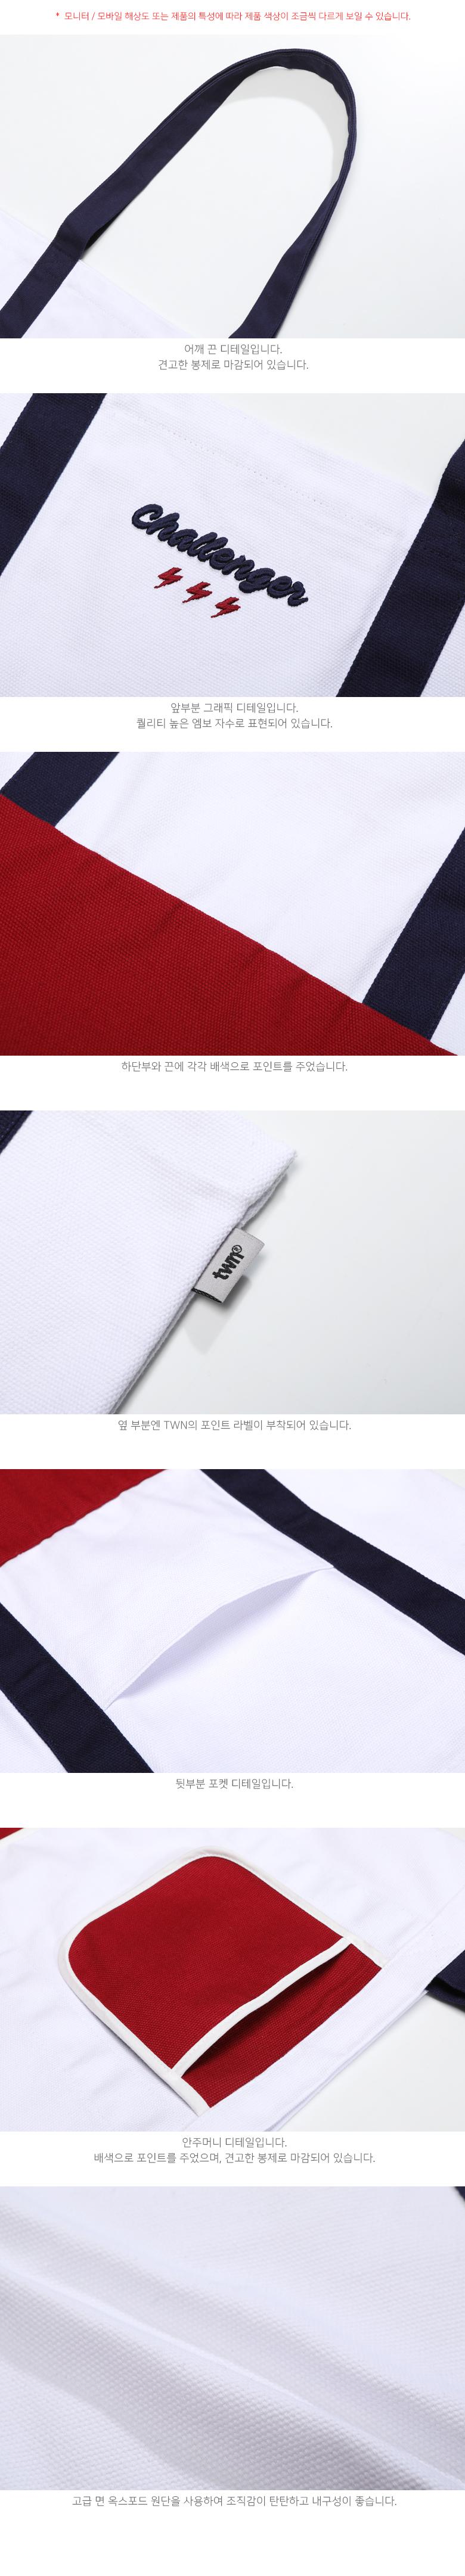 20190904_twn_challengerecobag_detail_white_lm_02.jpg